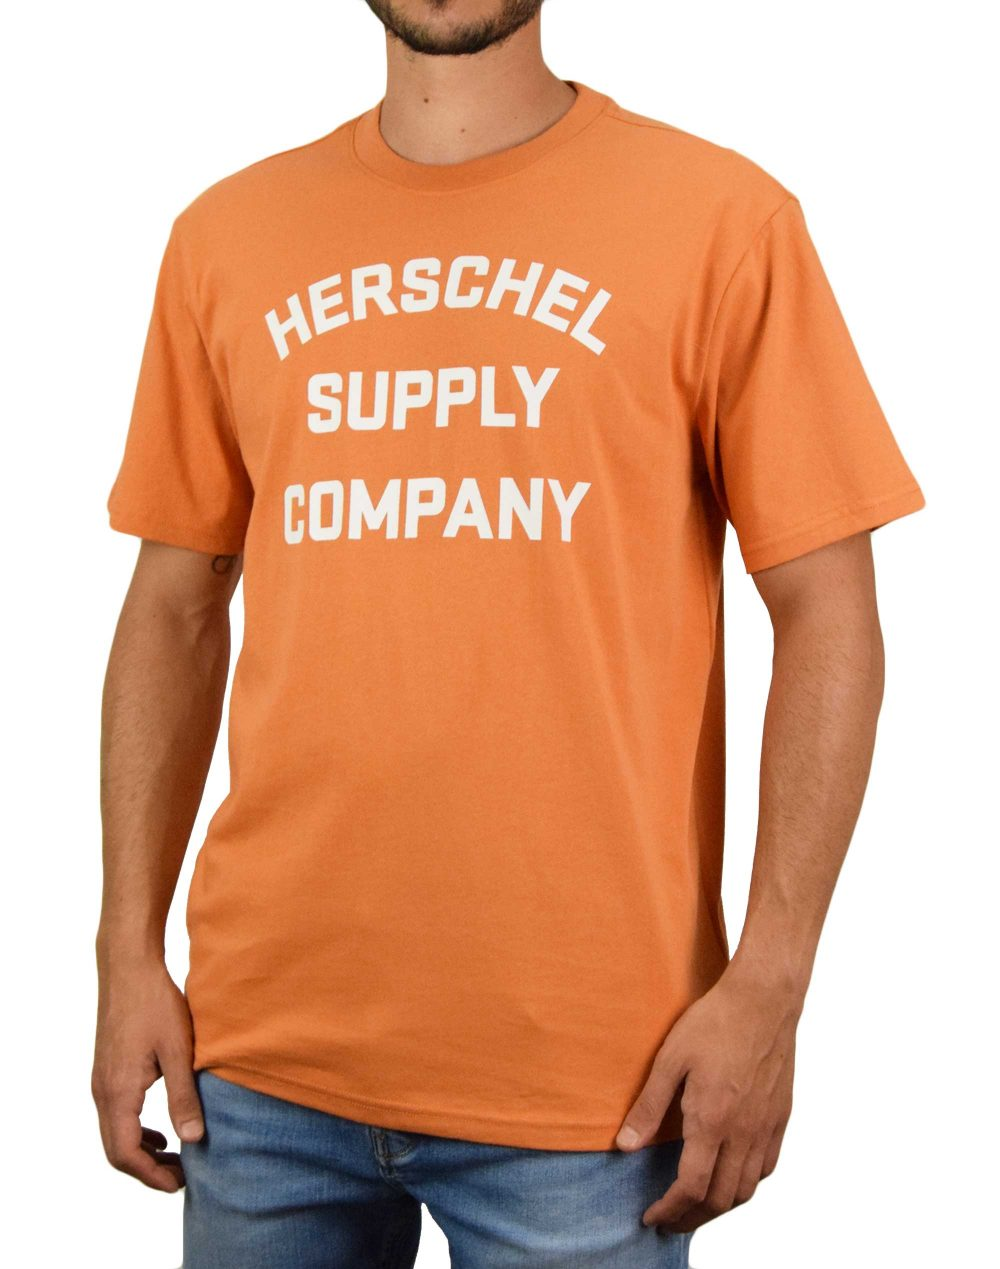 Herschel Supply Co Stacked Chest Tee (50027-00663) Papaya/White